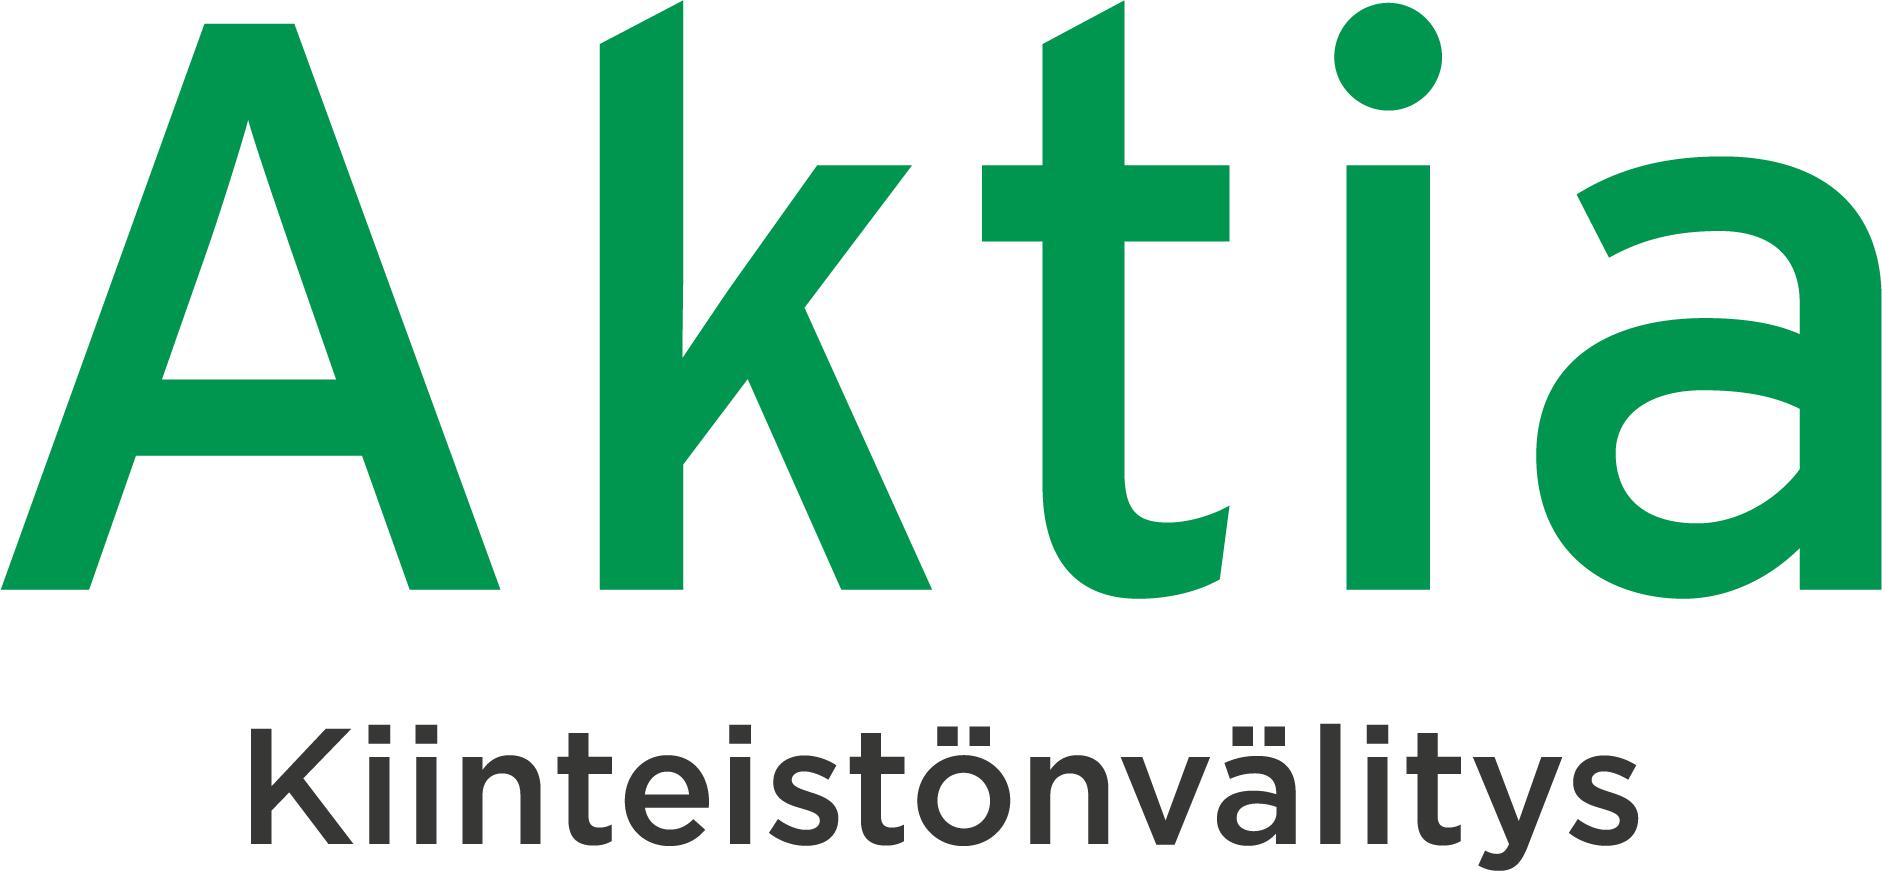 Aktia Kiinteistönvälitys Oy, Turku, Aktia Fastighetsförmedli